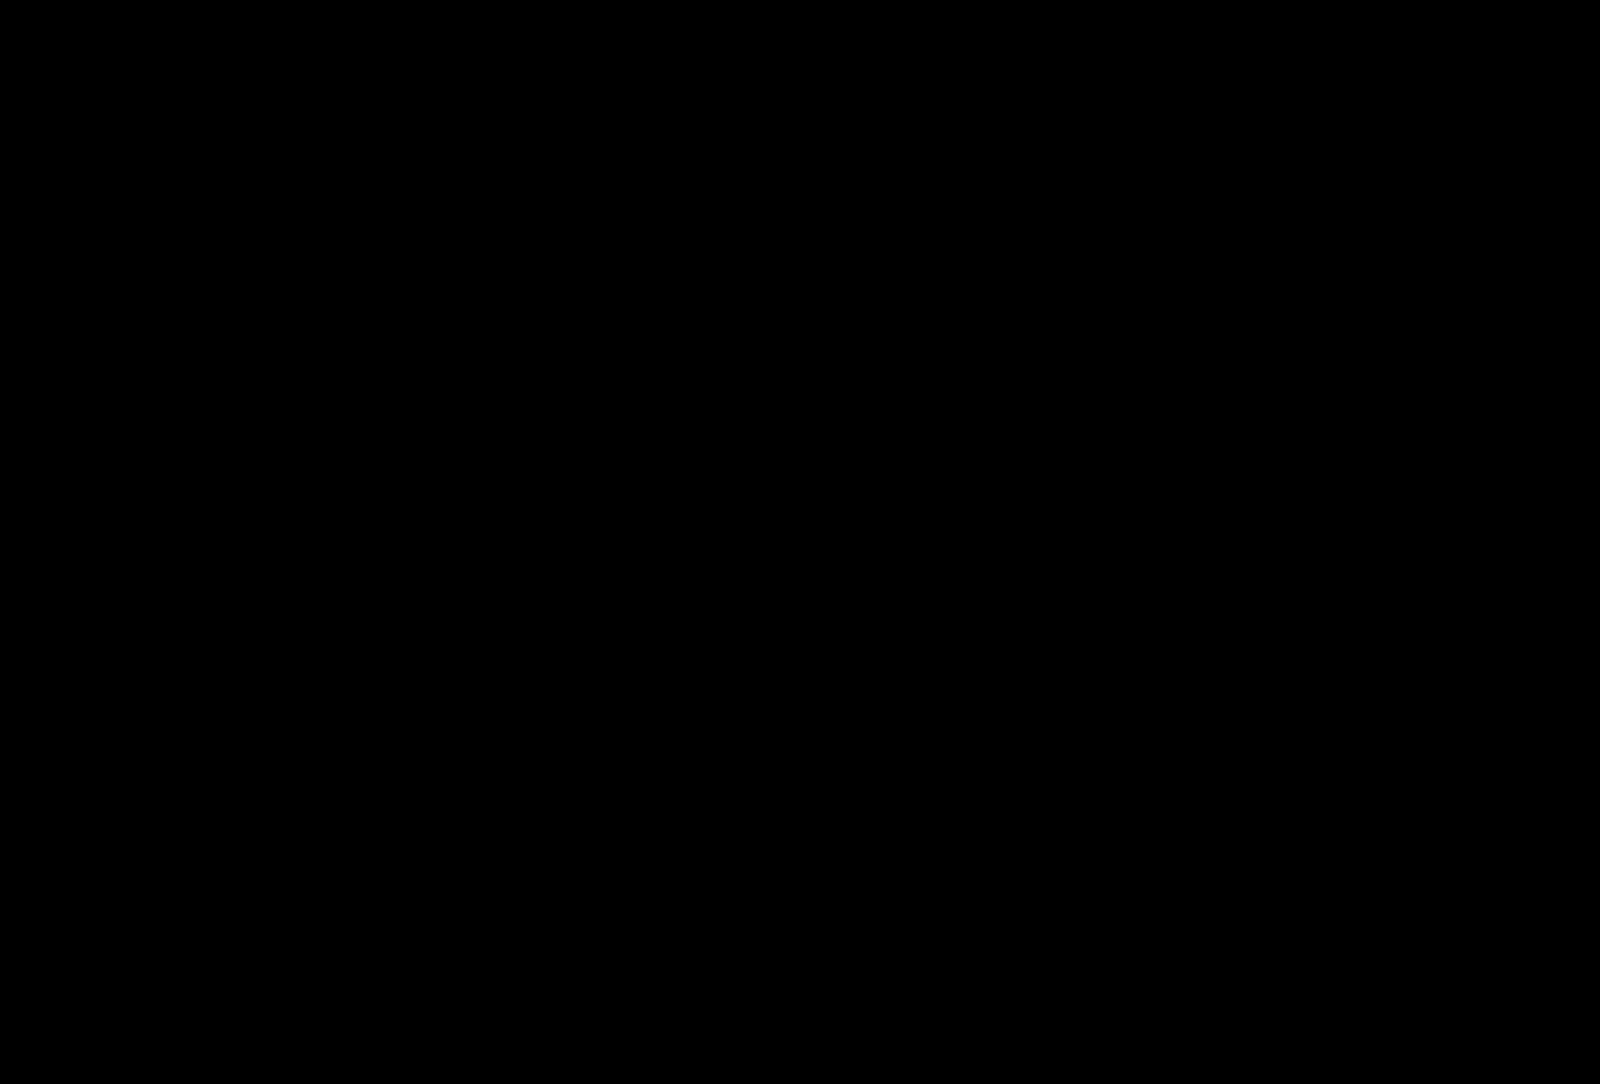 Daihatsu Terios manufacturer logo